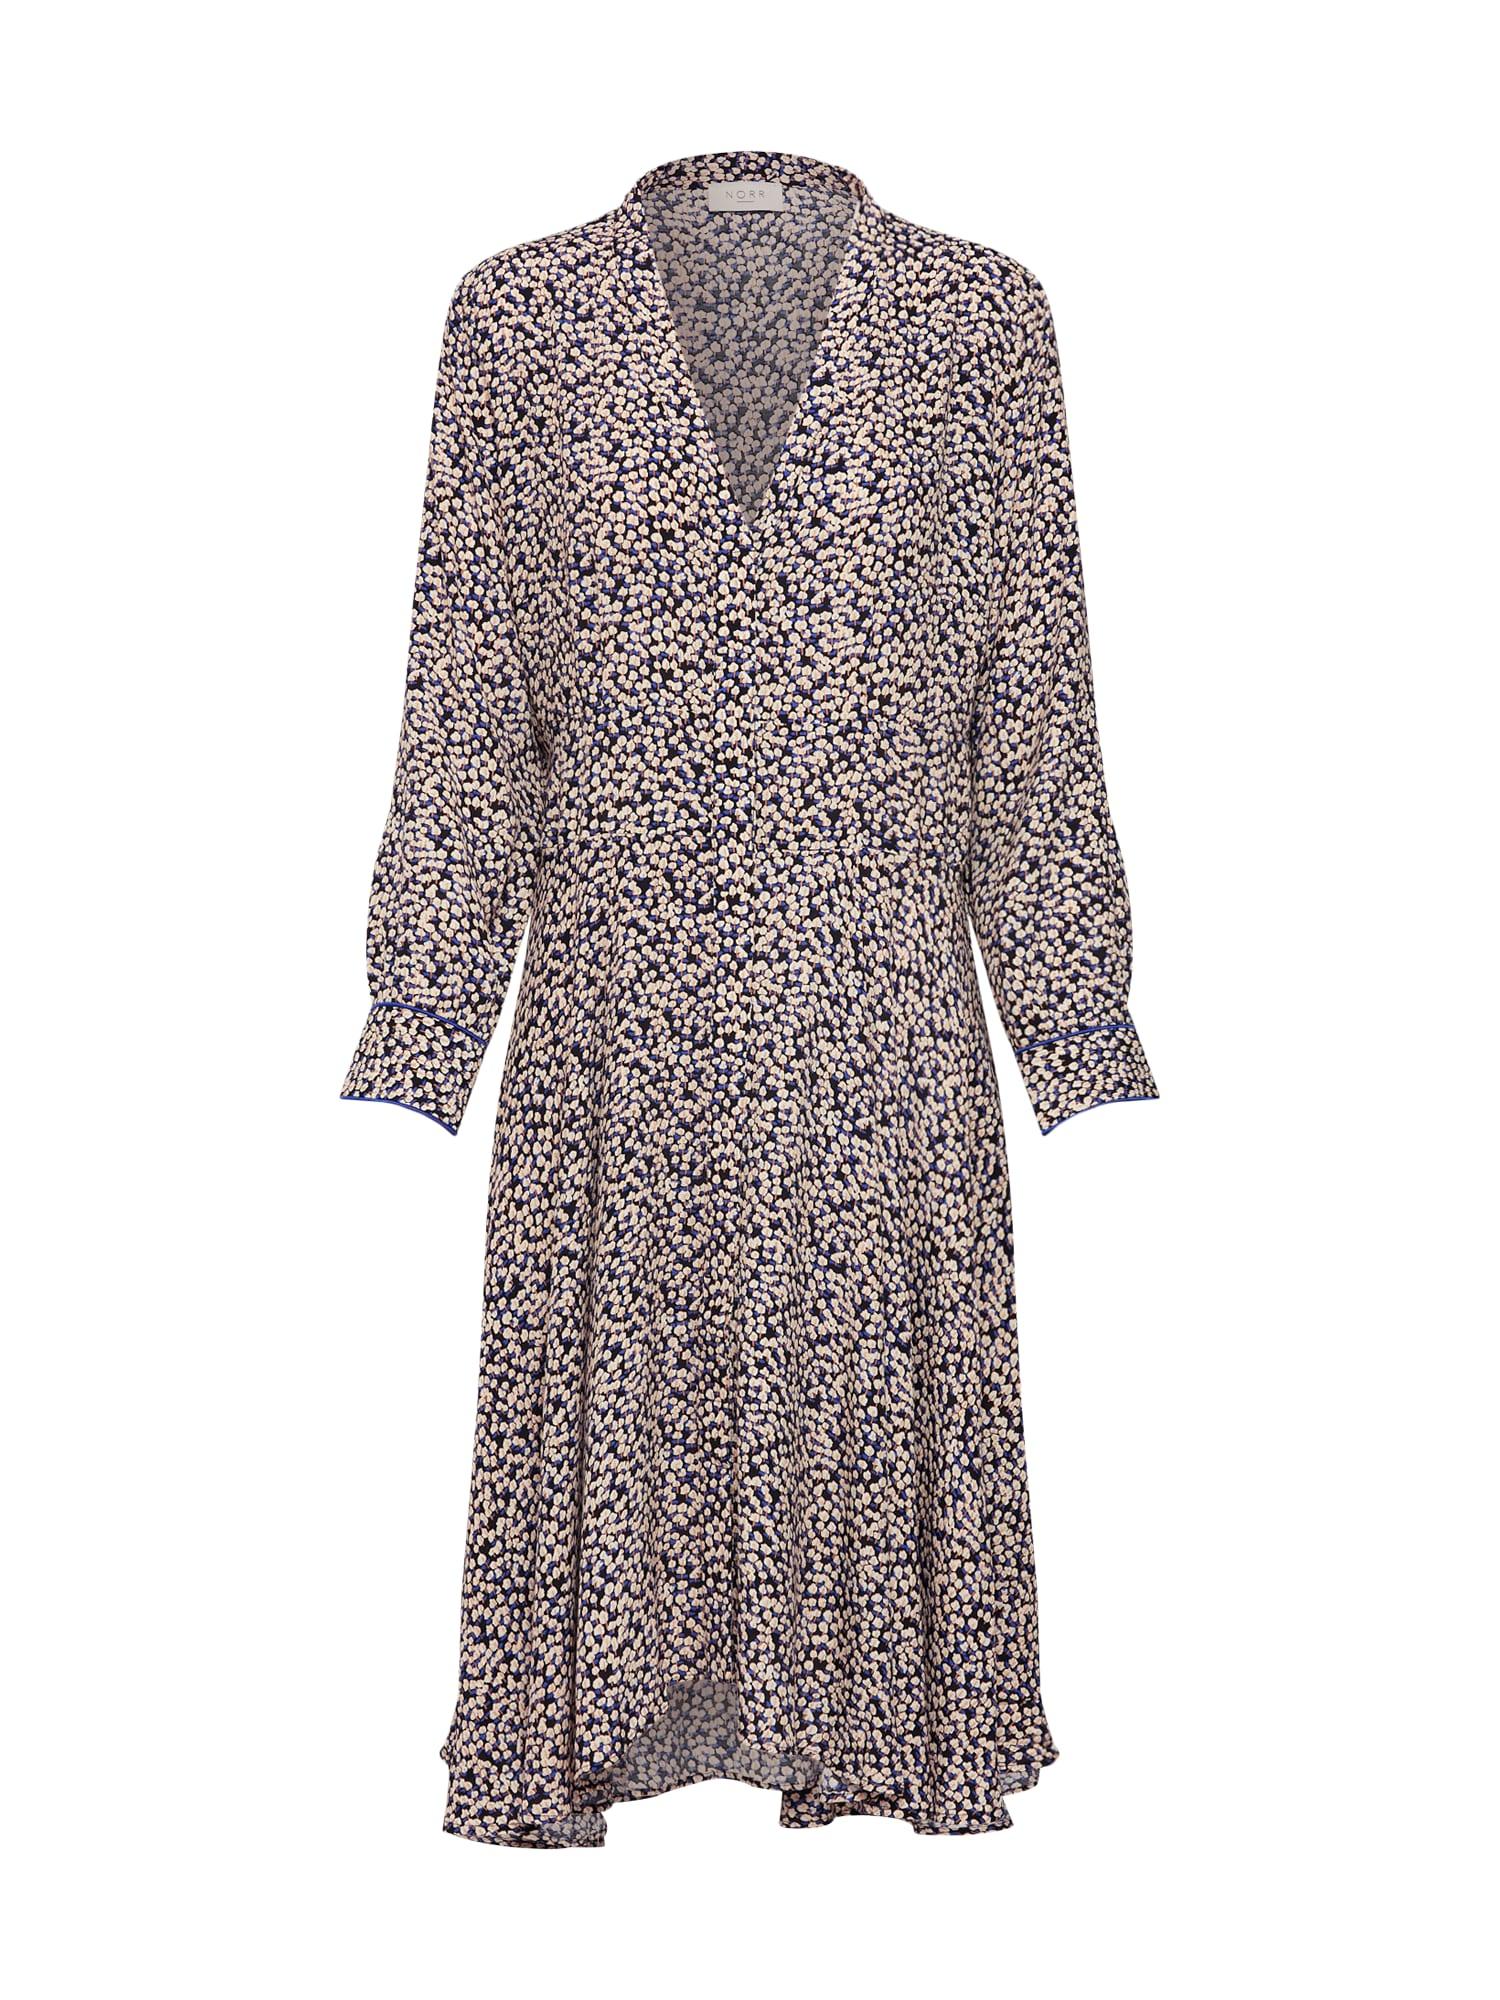 Šaty Debra Dress černá NORR